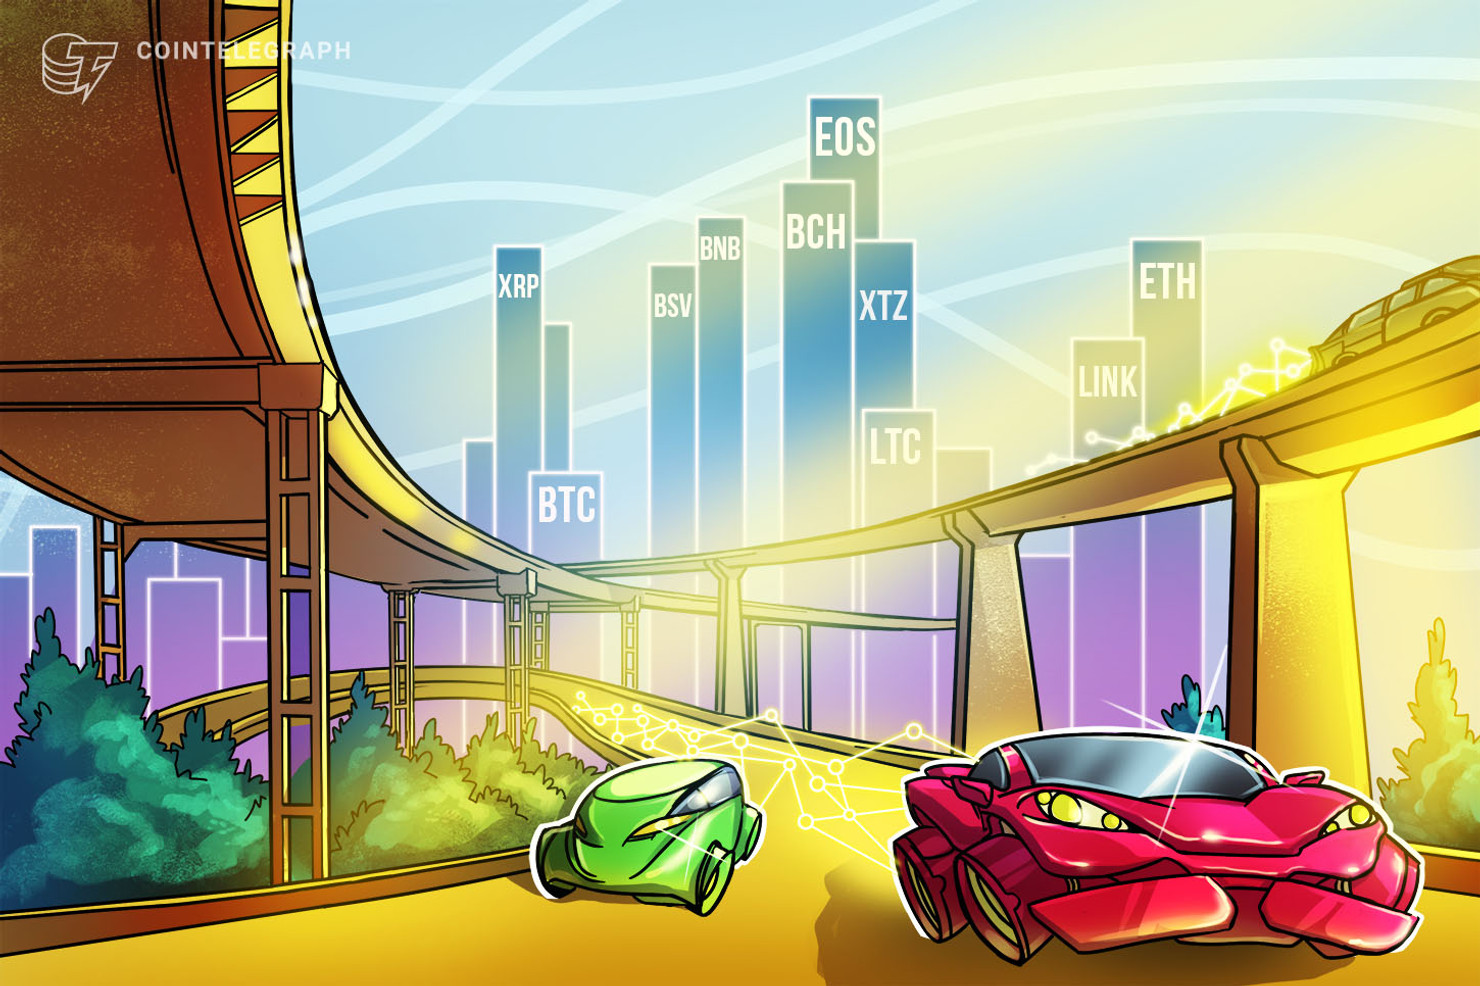 Price Analysis Feb 19: BTC, ETH, XRP, BCH, BSV, LTC, EOS, BNB, XTZ, LINK